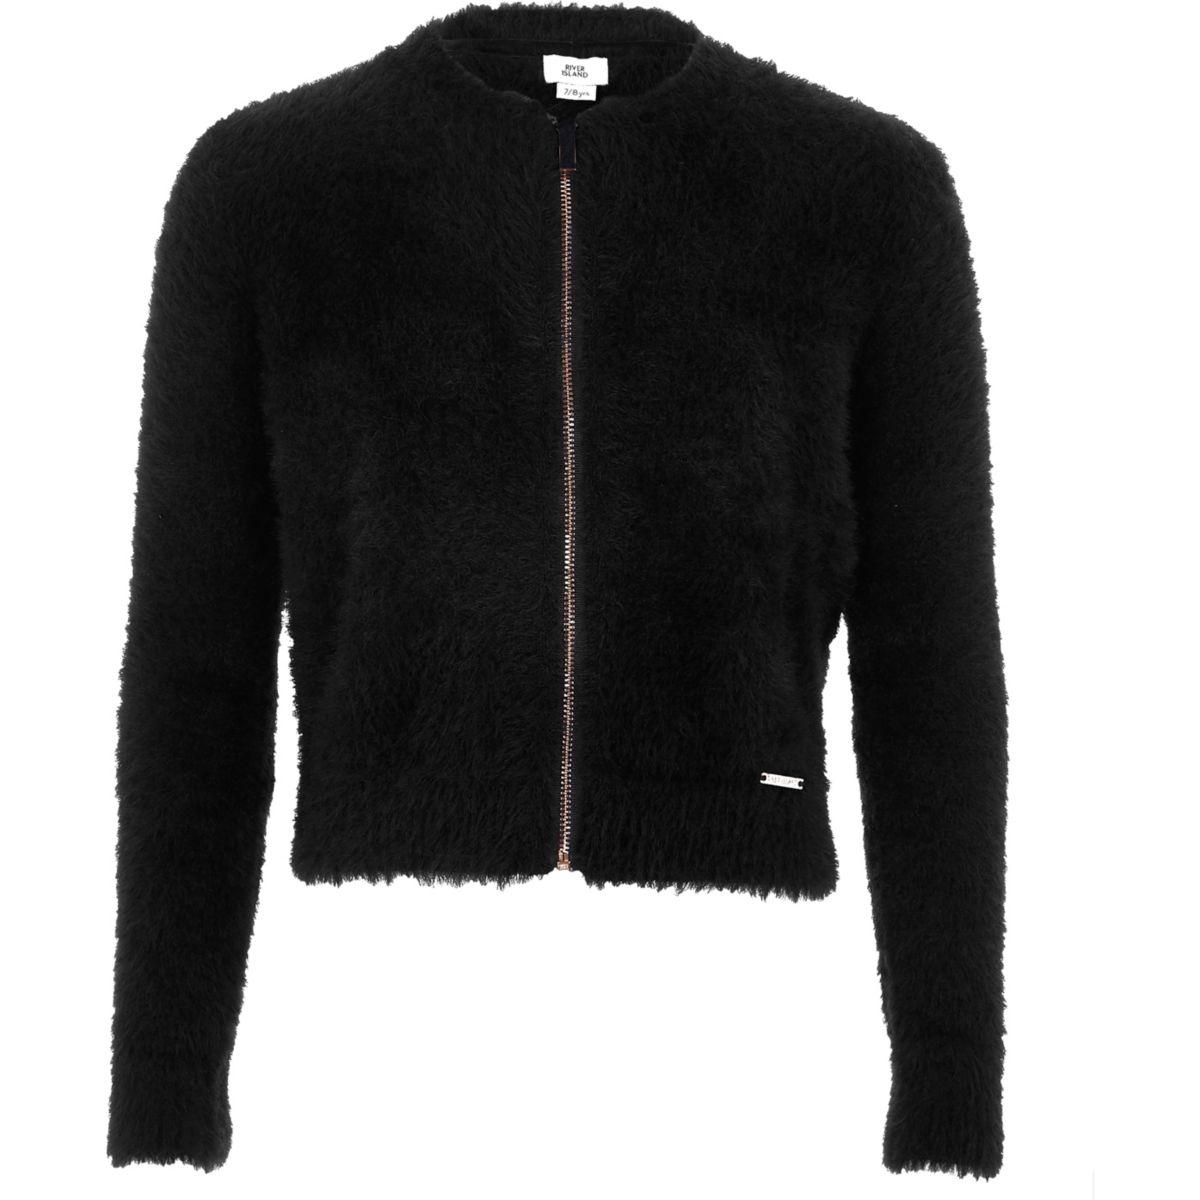 Girls black fluffy zip-up cardigan